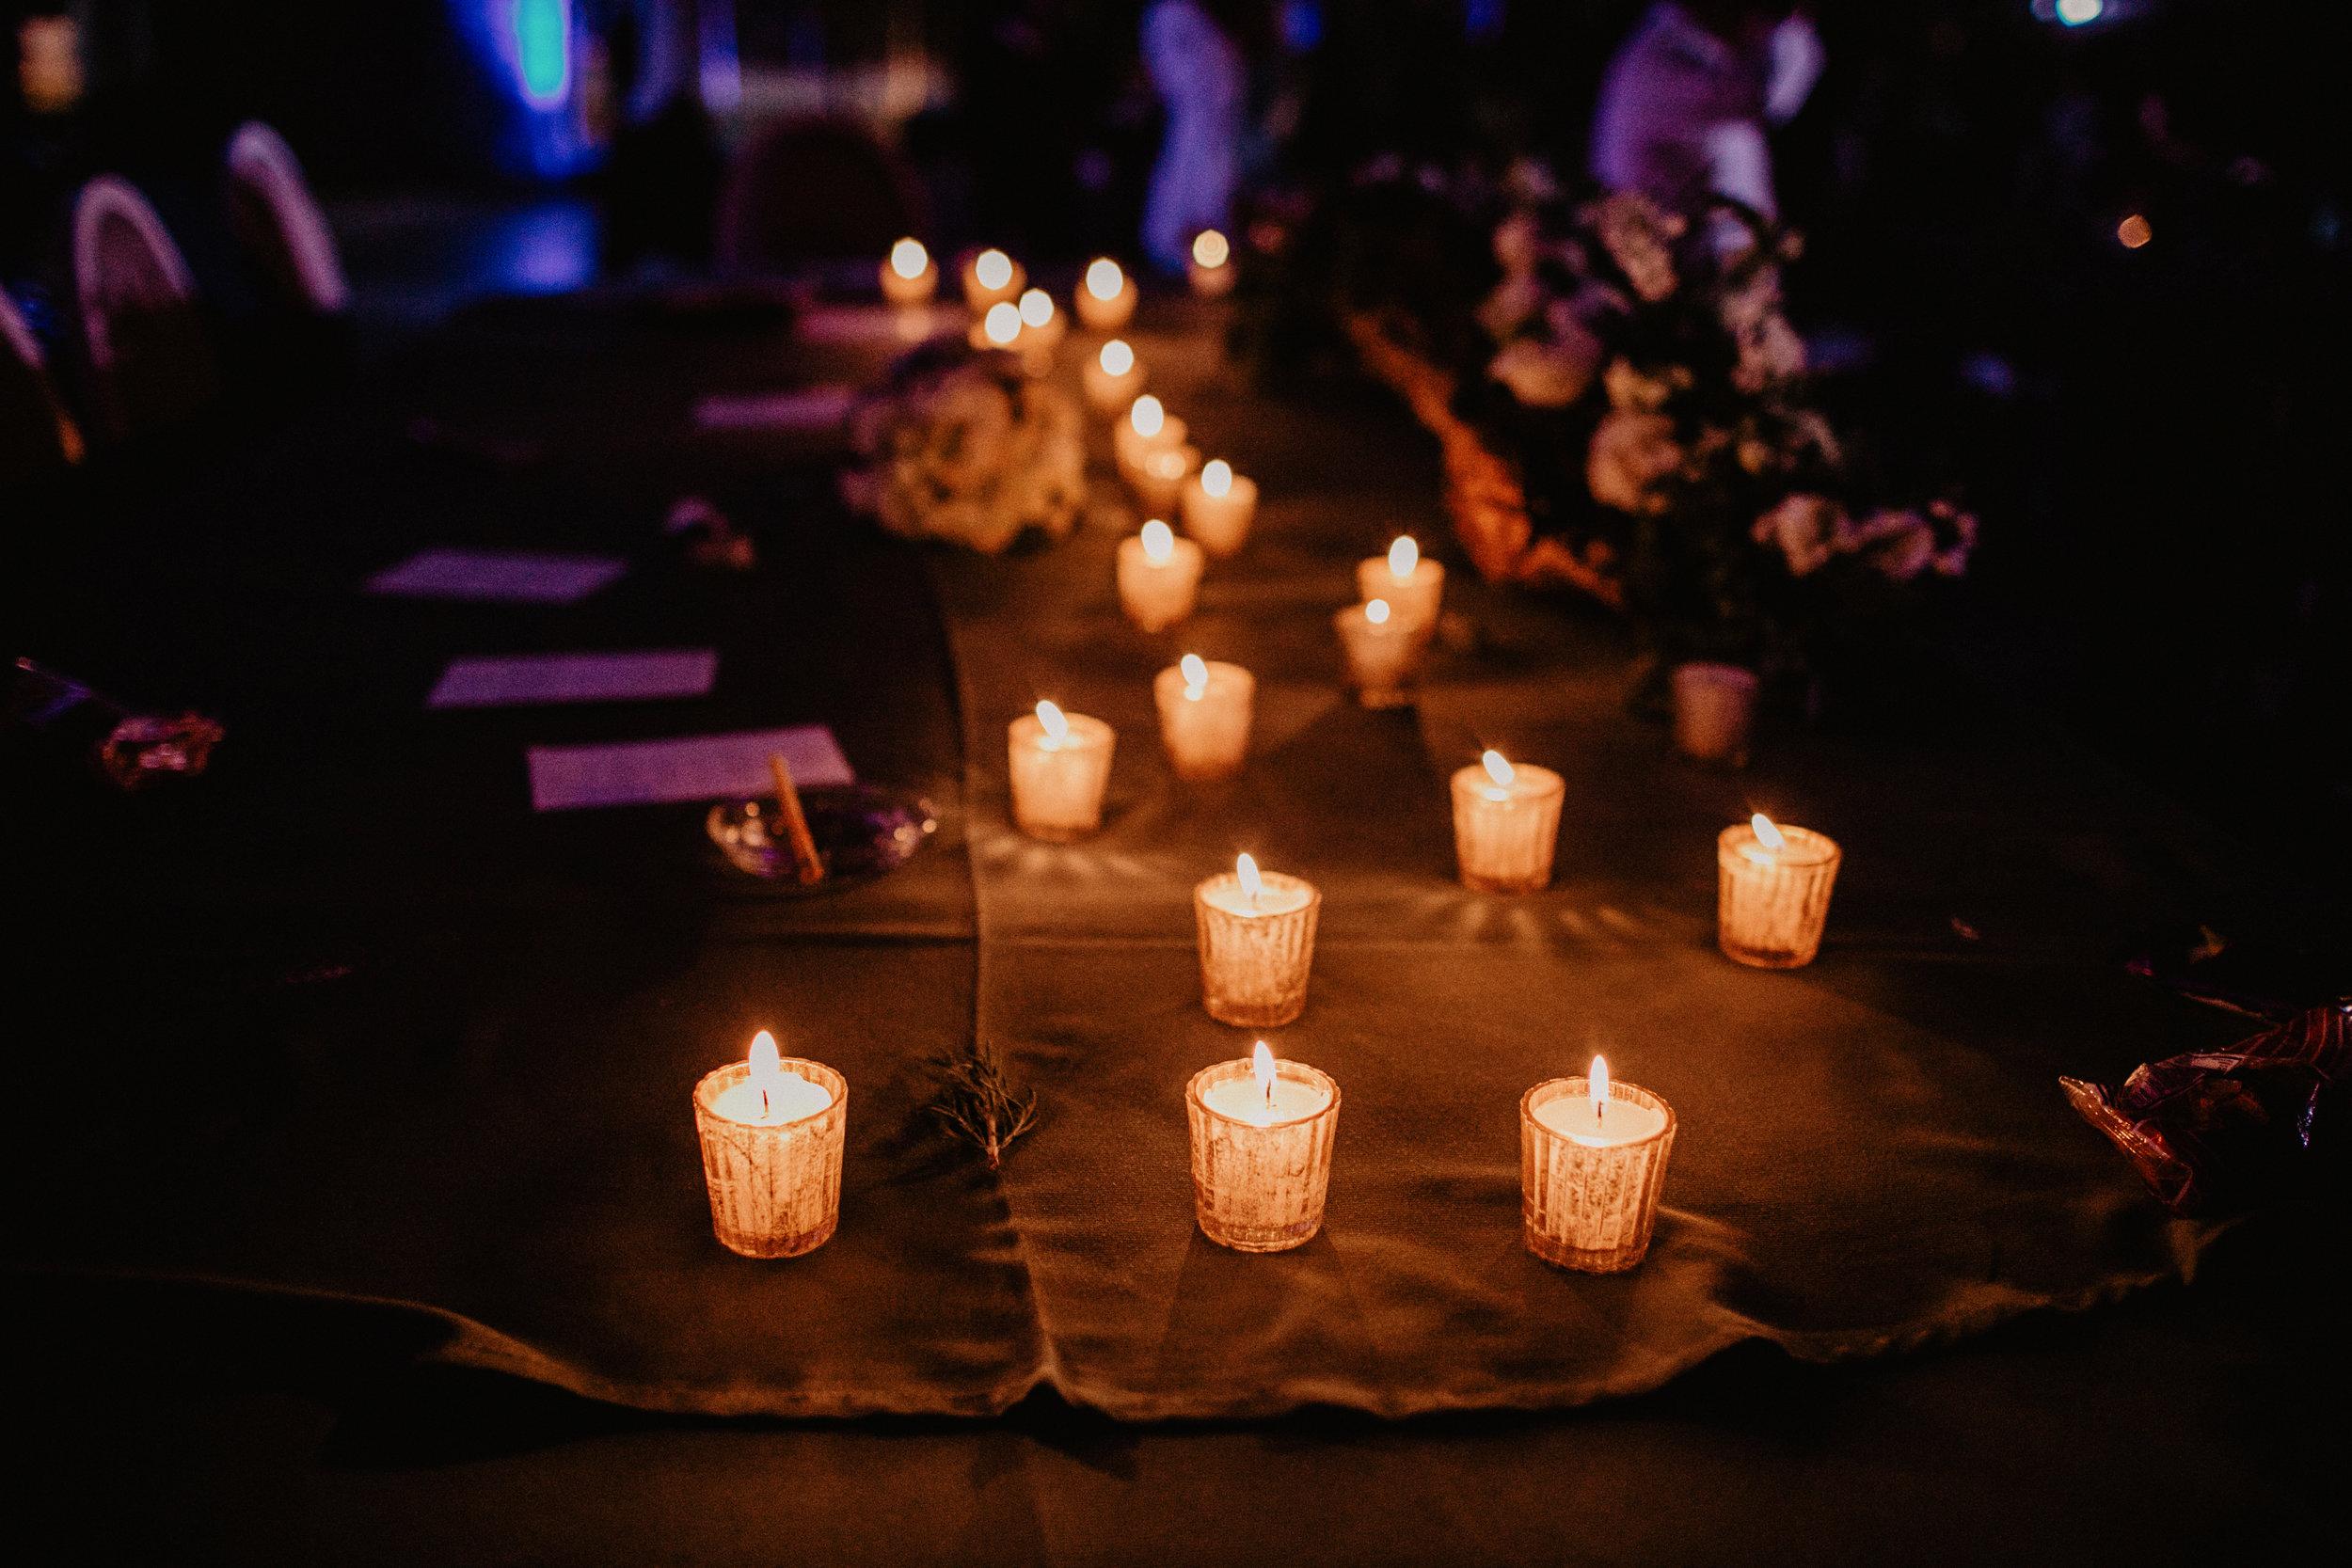 alfonso_flores_destination_wedding_photographer_pau_alonso_1086.JPG